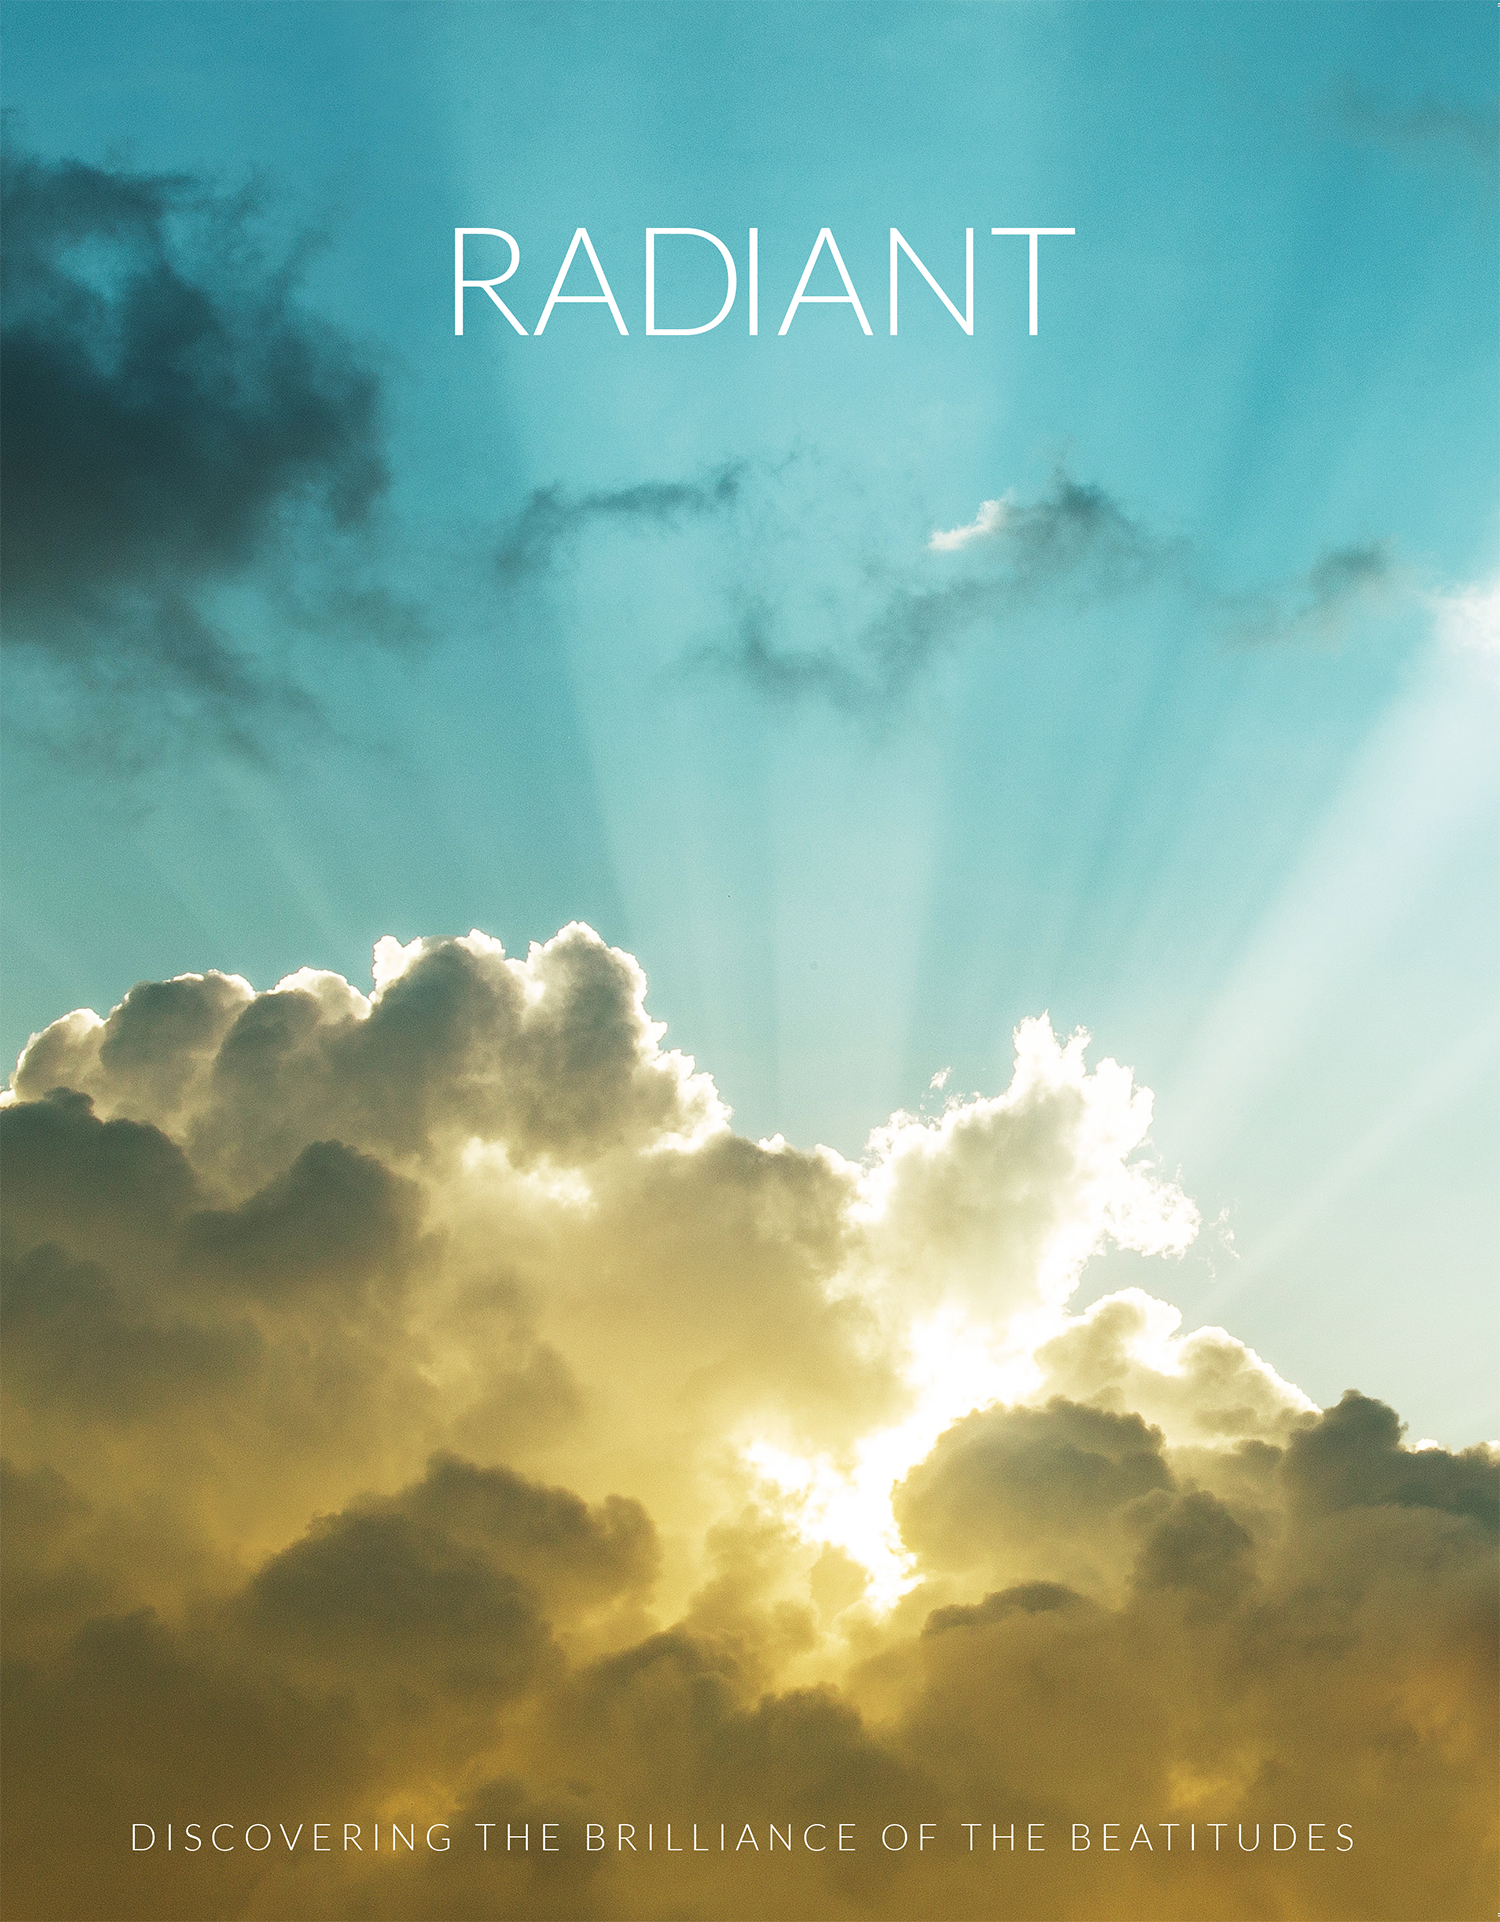 HR_final_1c_Radiant.jpg